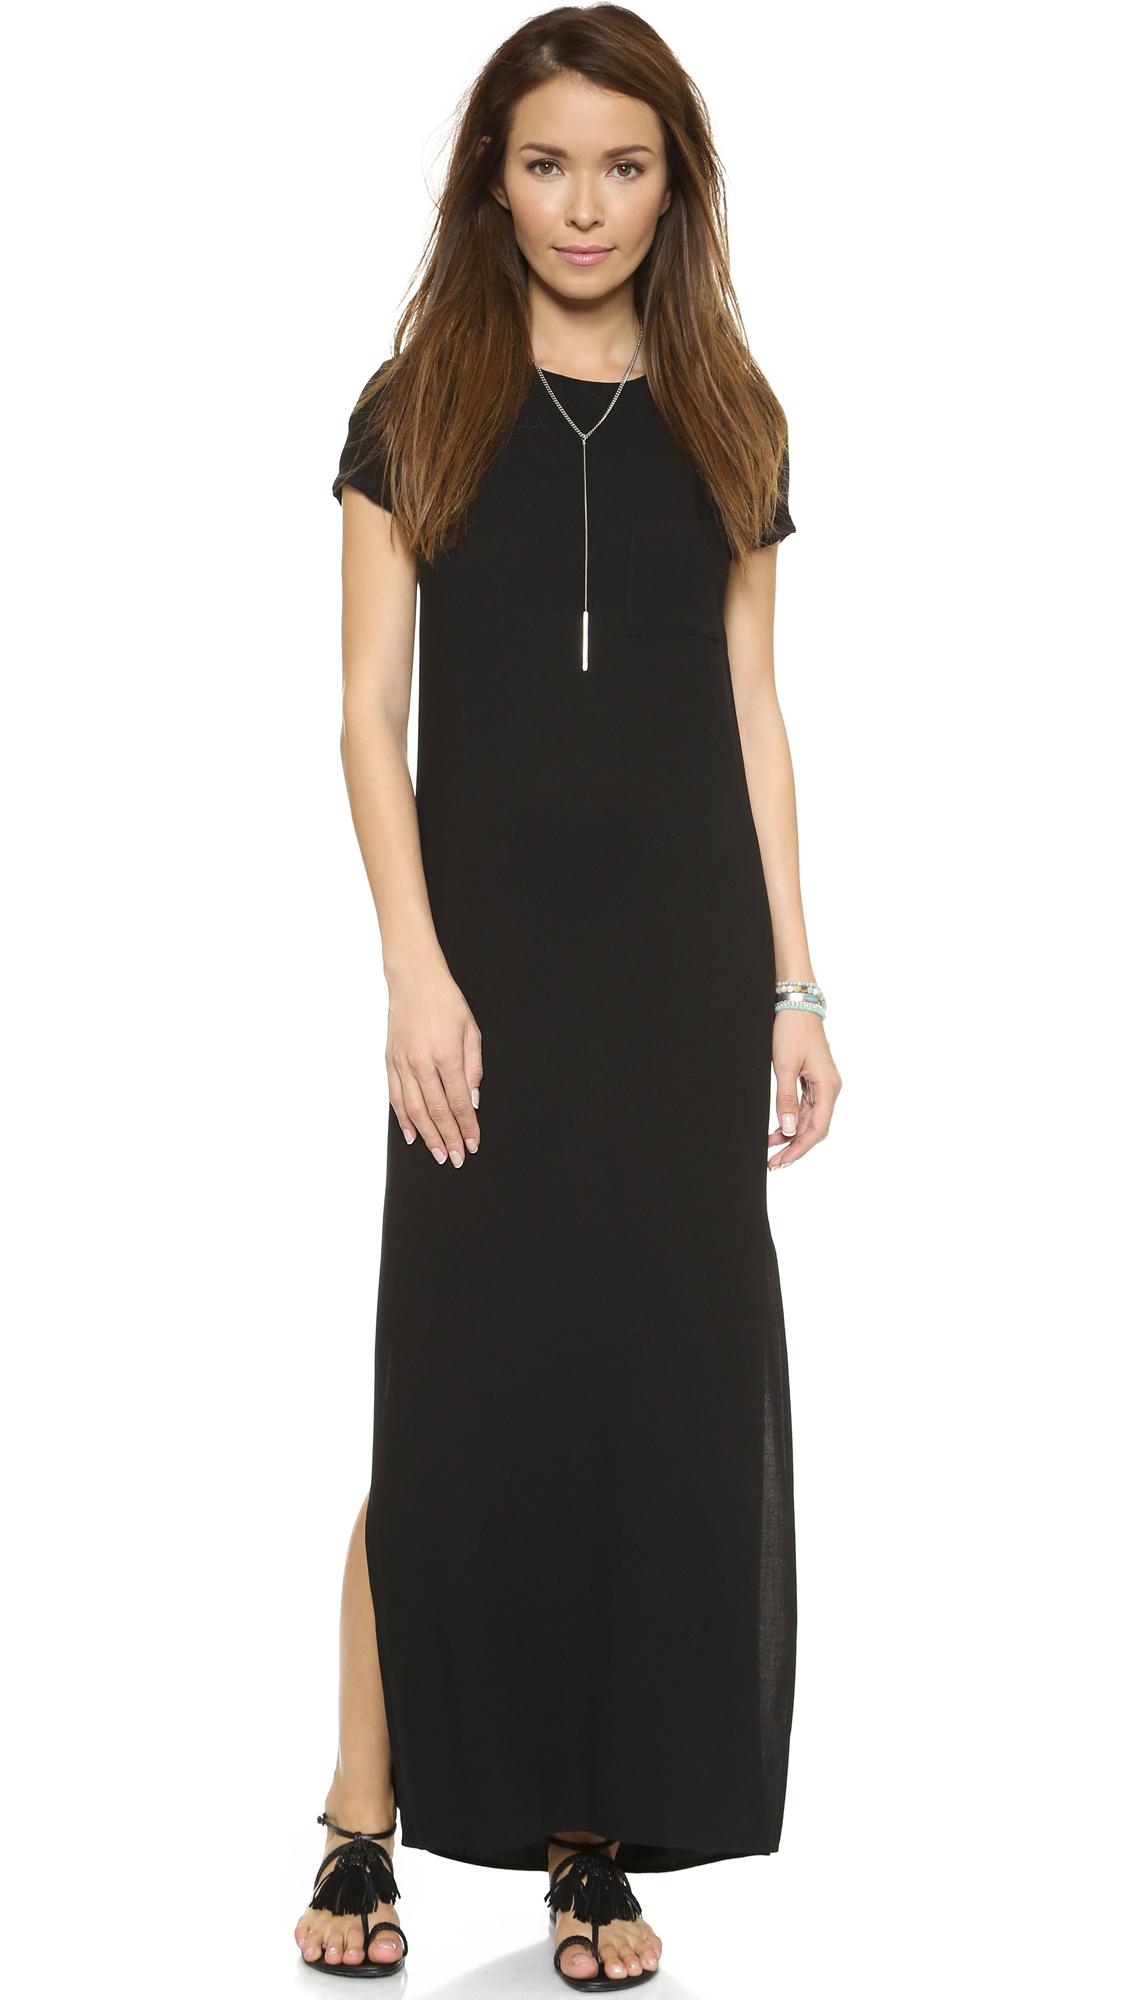 Black black t shirt maxi dress - Gallery Previously Sold At Shopbop Women S T Shirt Dresses